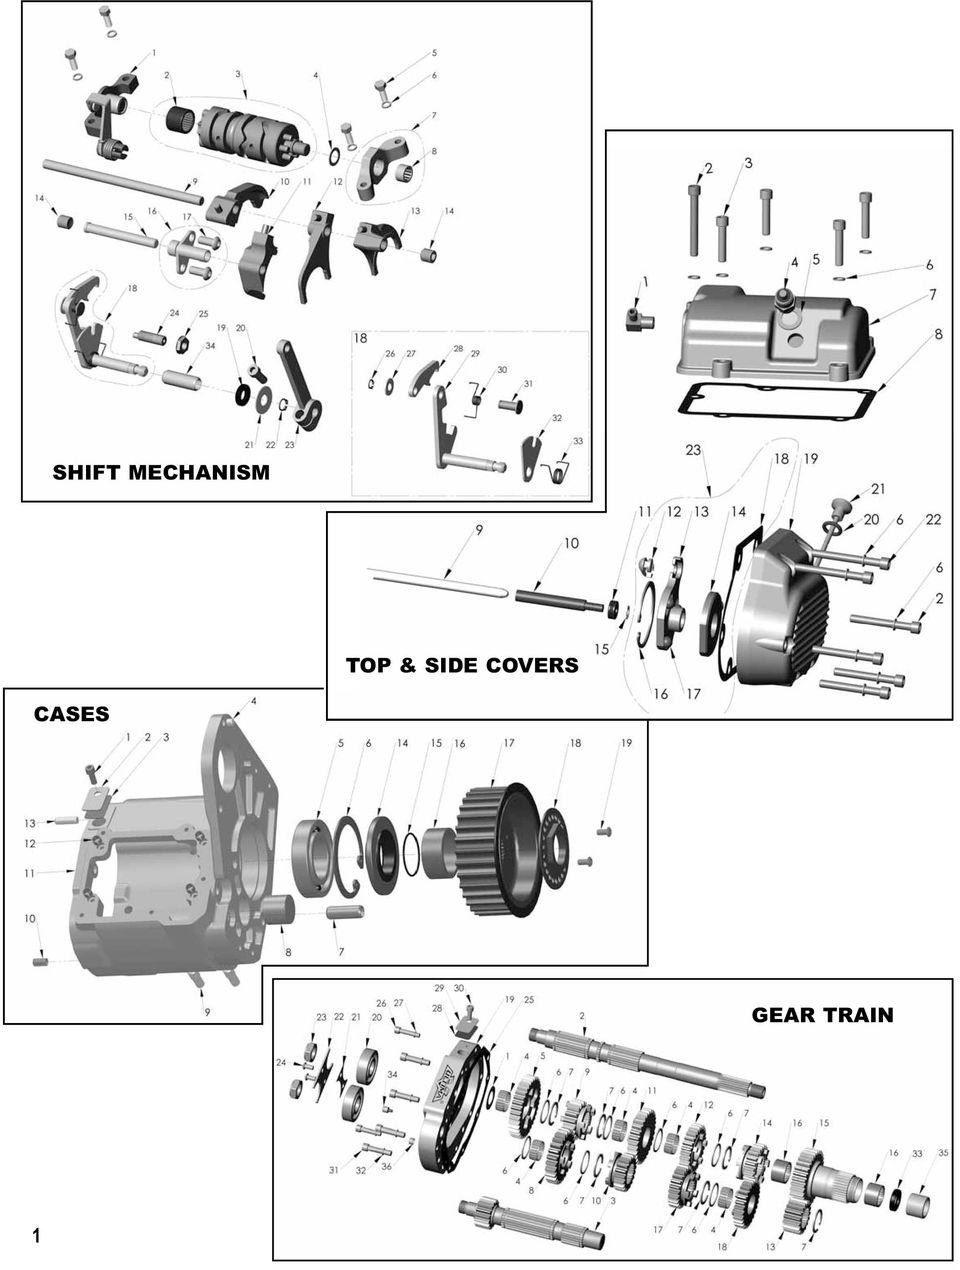 hight resolution of ultima 6 speed lsd manual 201 57 201 58 pdf rh docplayer net cj5 clutch diagram